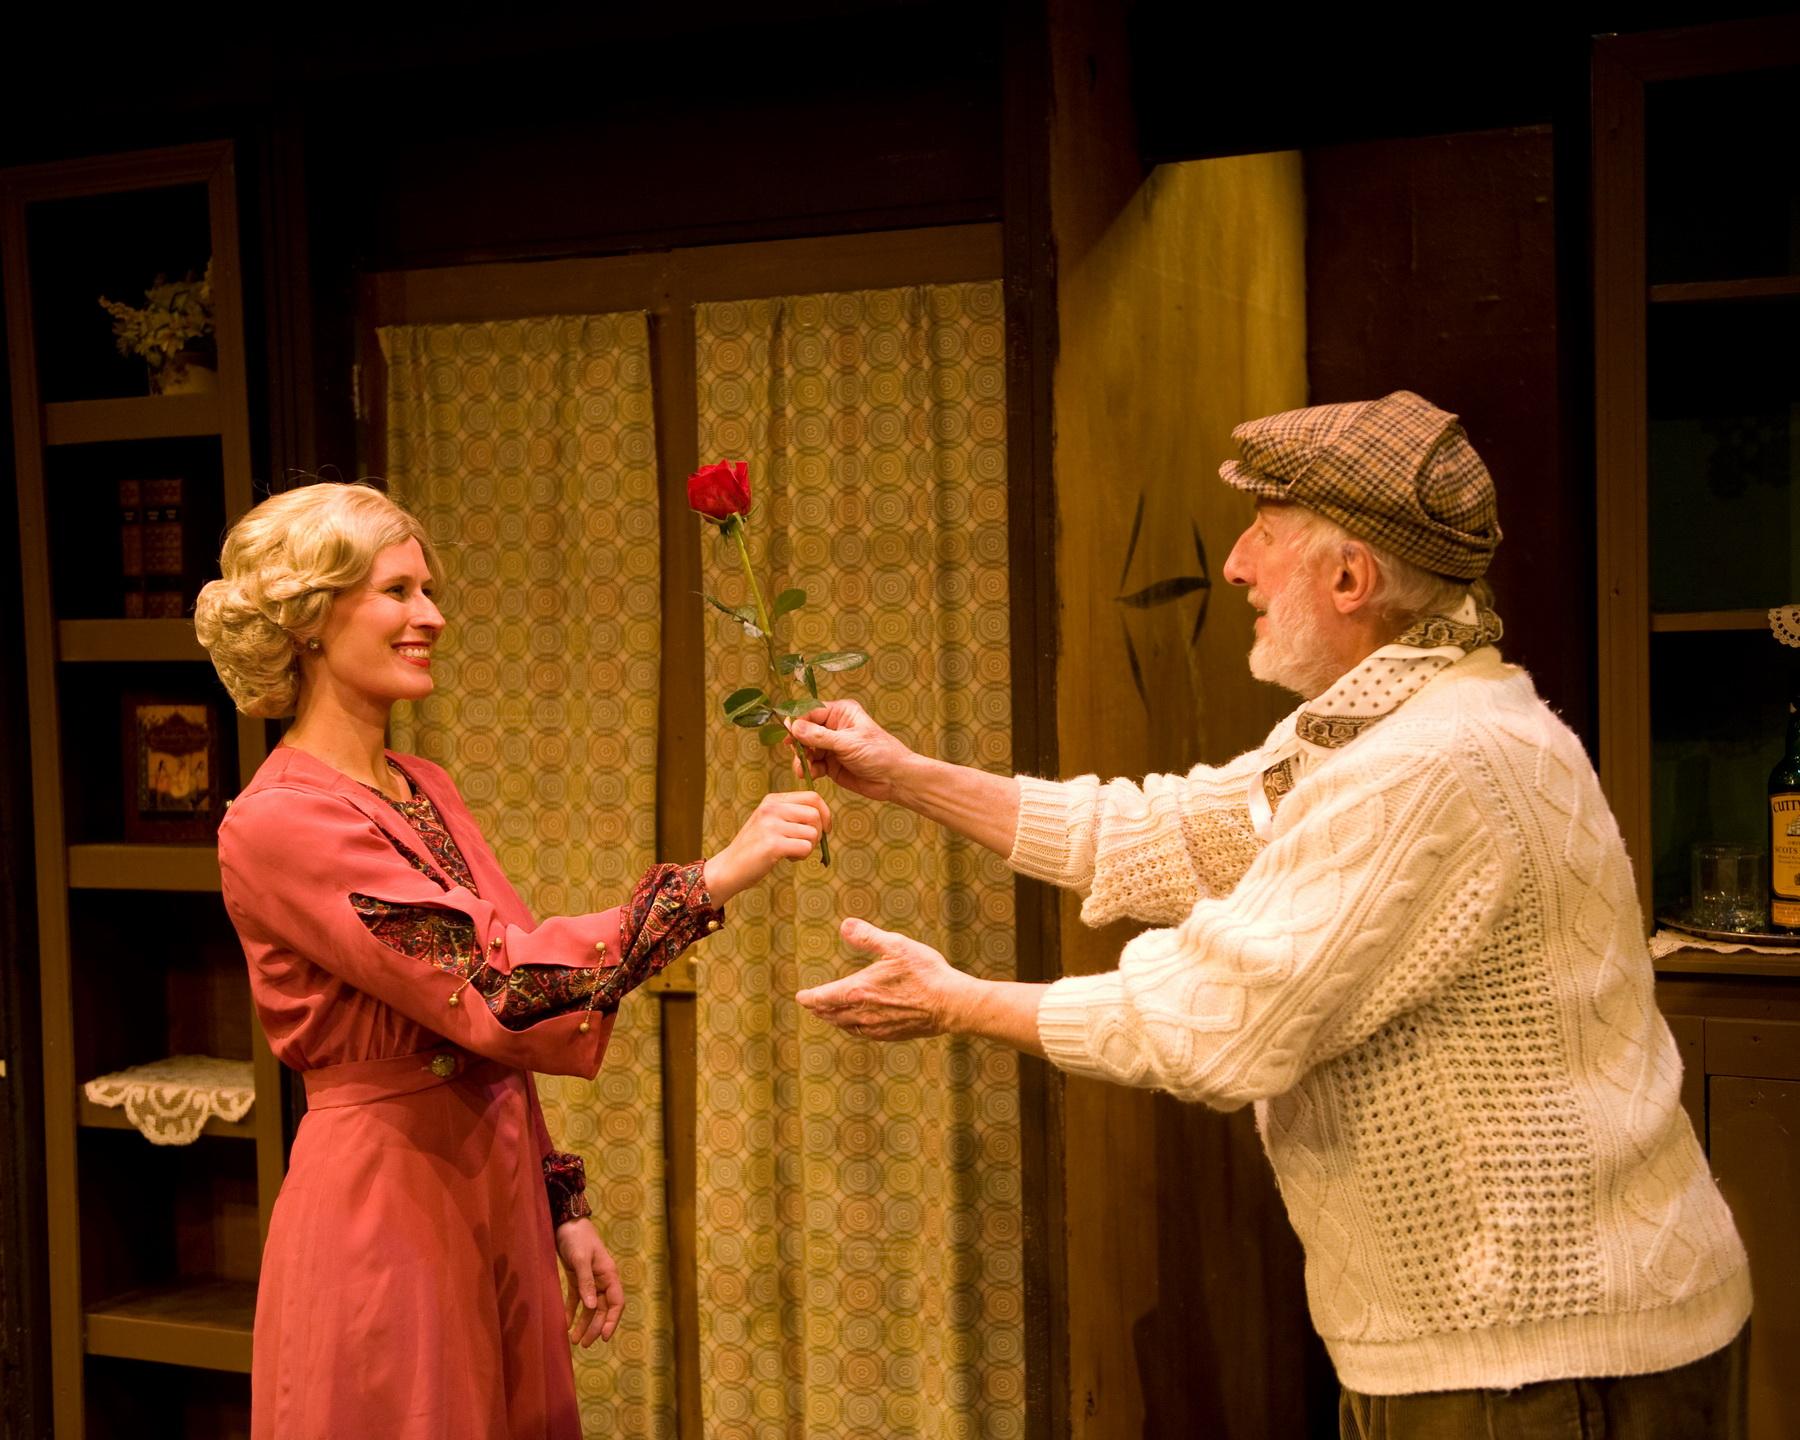 Jill Kenderes as Cecily Harrington and Raymond E. Cosma, Jr. as Hodgson